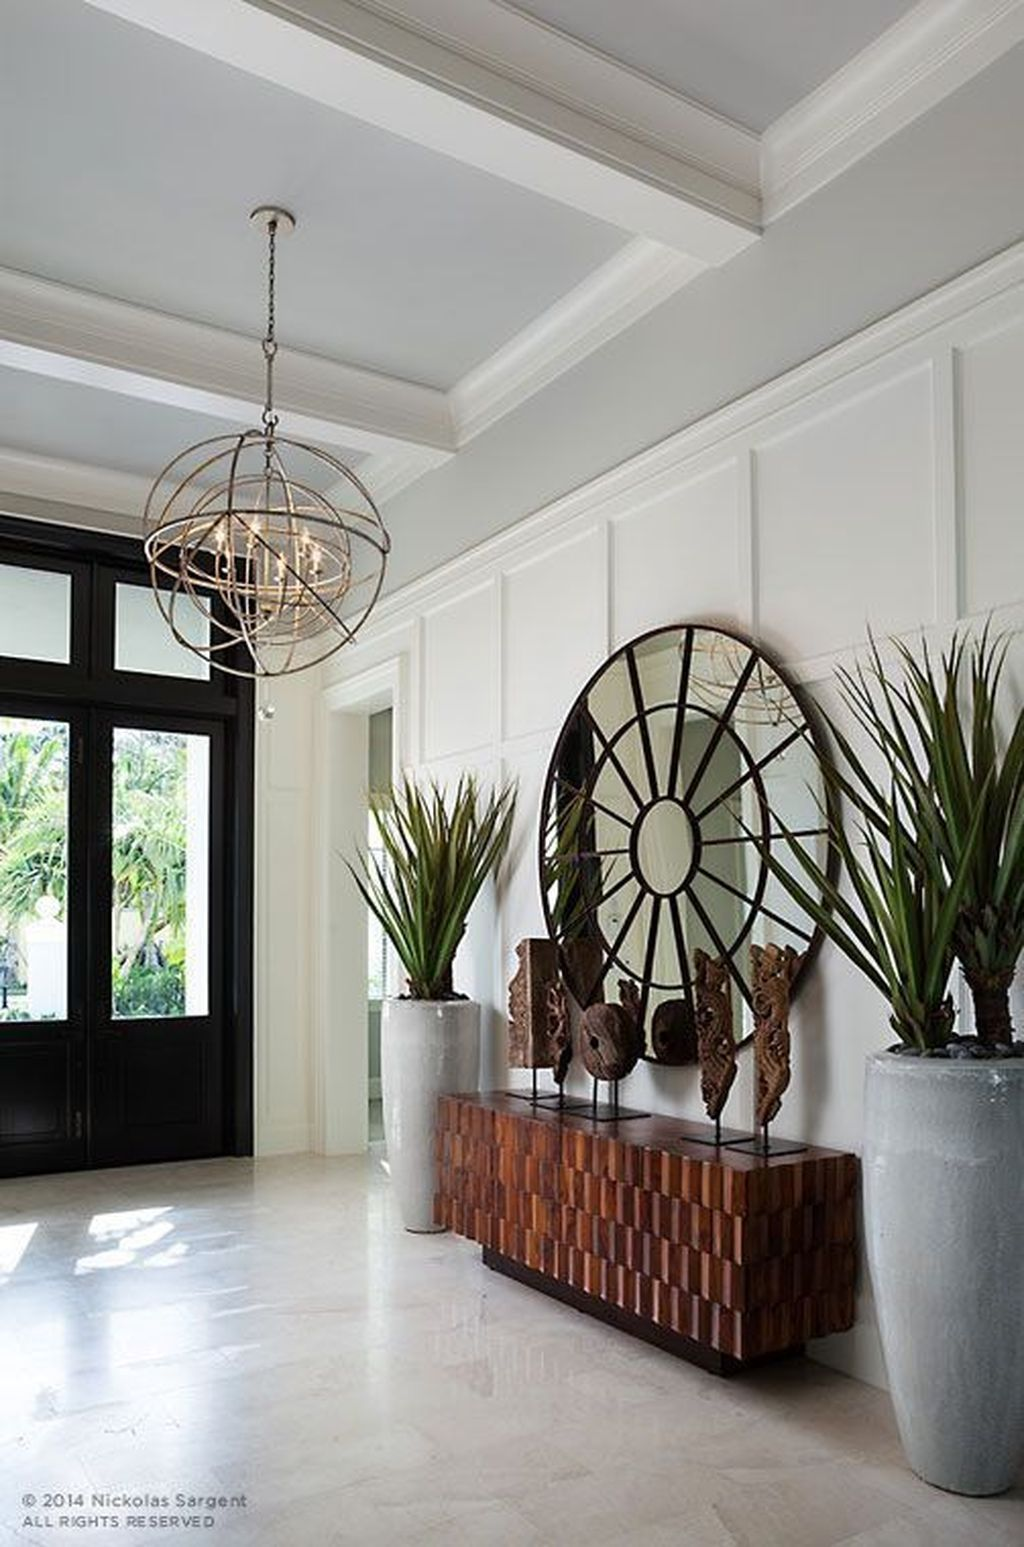 42 Stunning Modern Entryway Design Ideas Homyhomee Foyer Furniture Foyer Design Entry Way Design